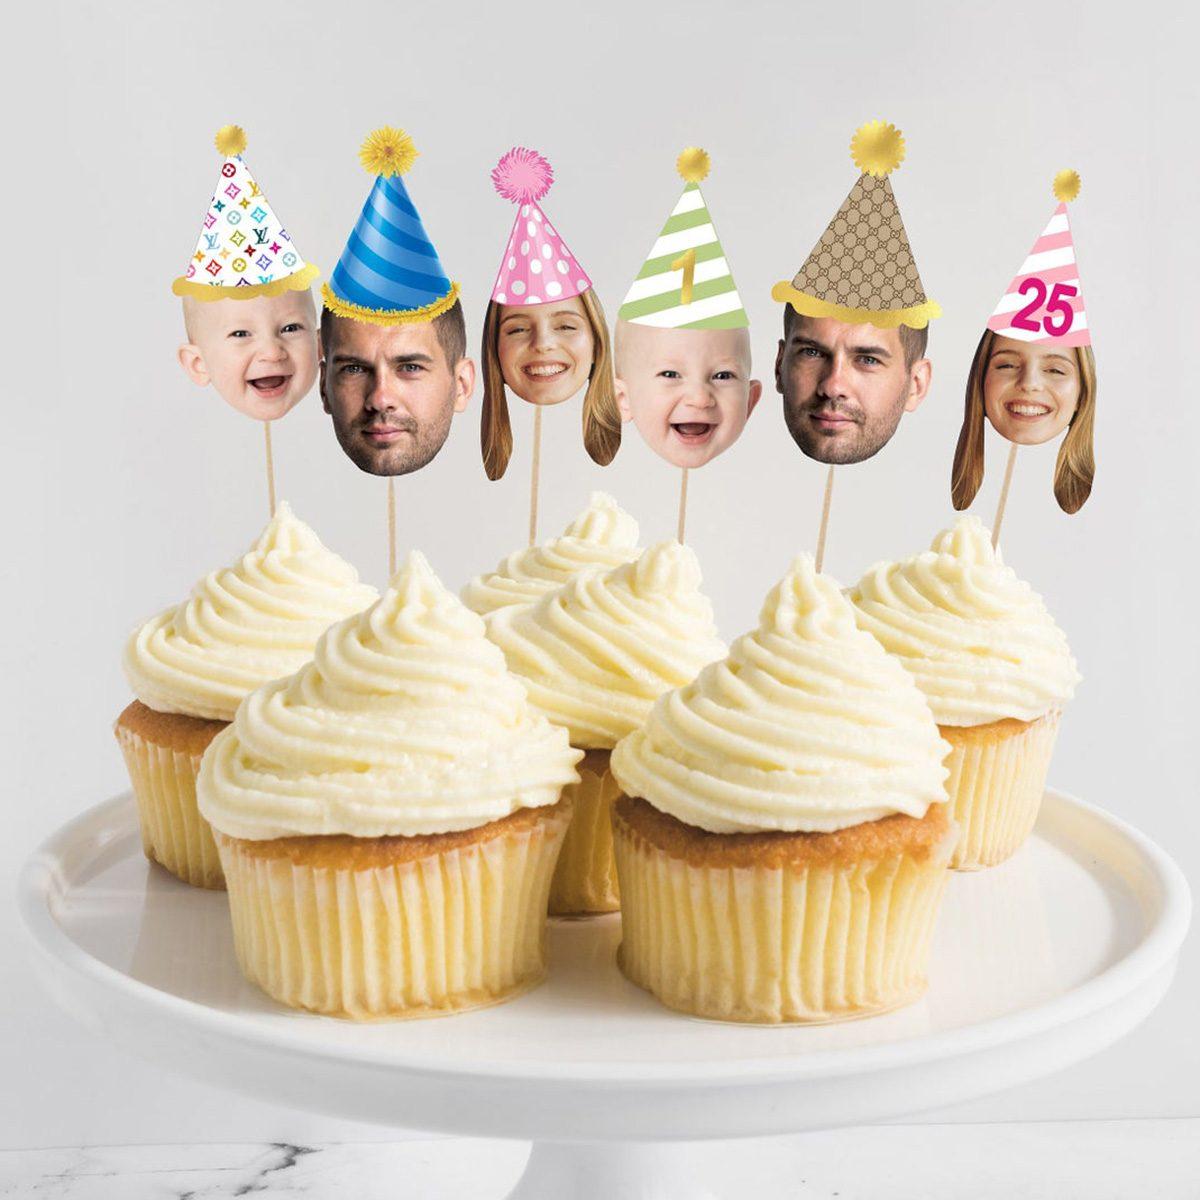 Cupcake Box Topper Cake Topper Occasion Box Topper Birthday